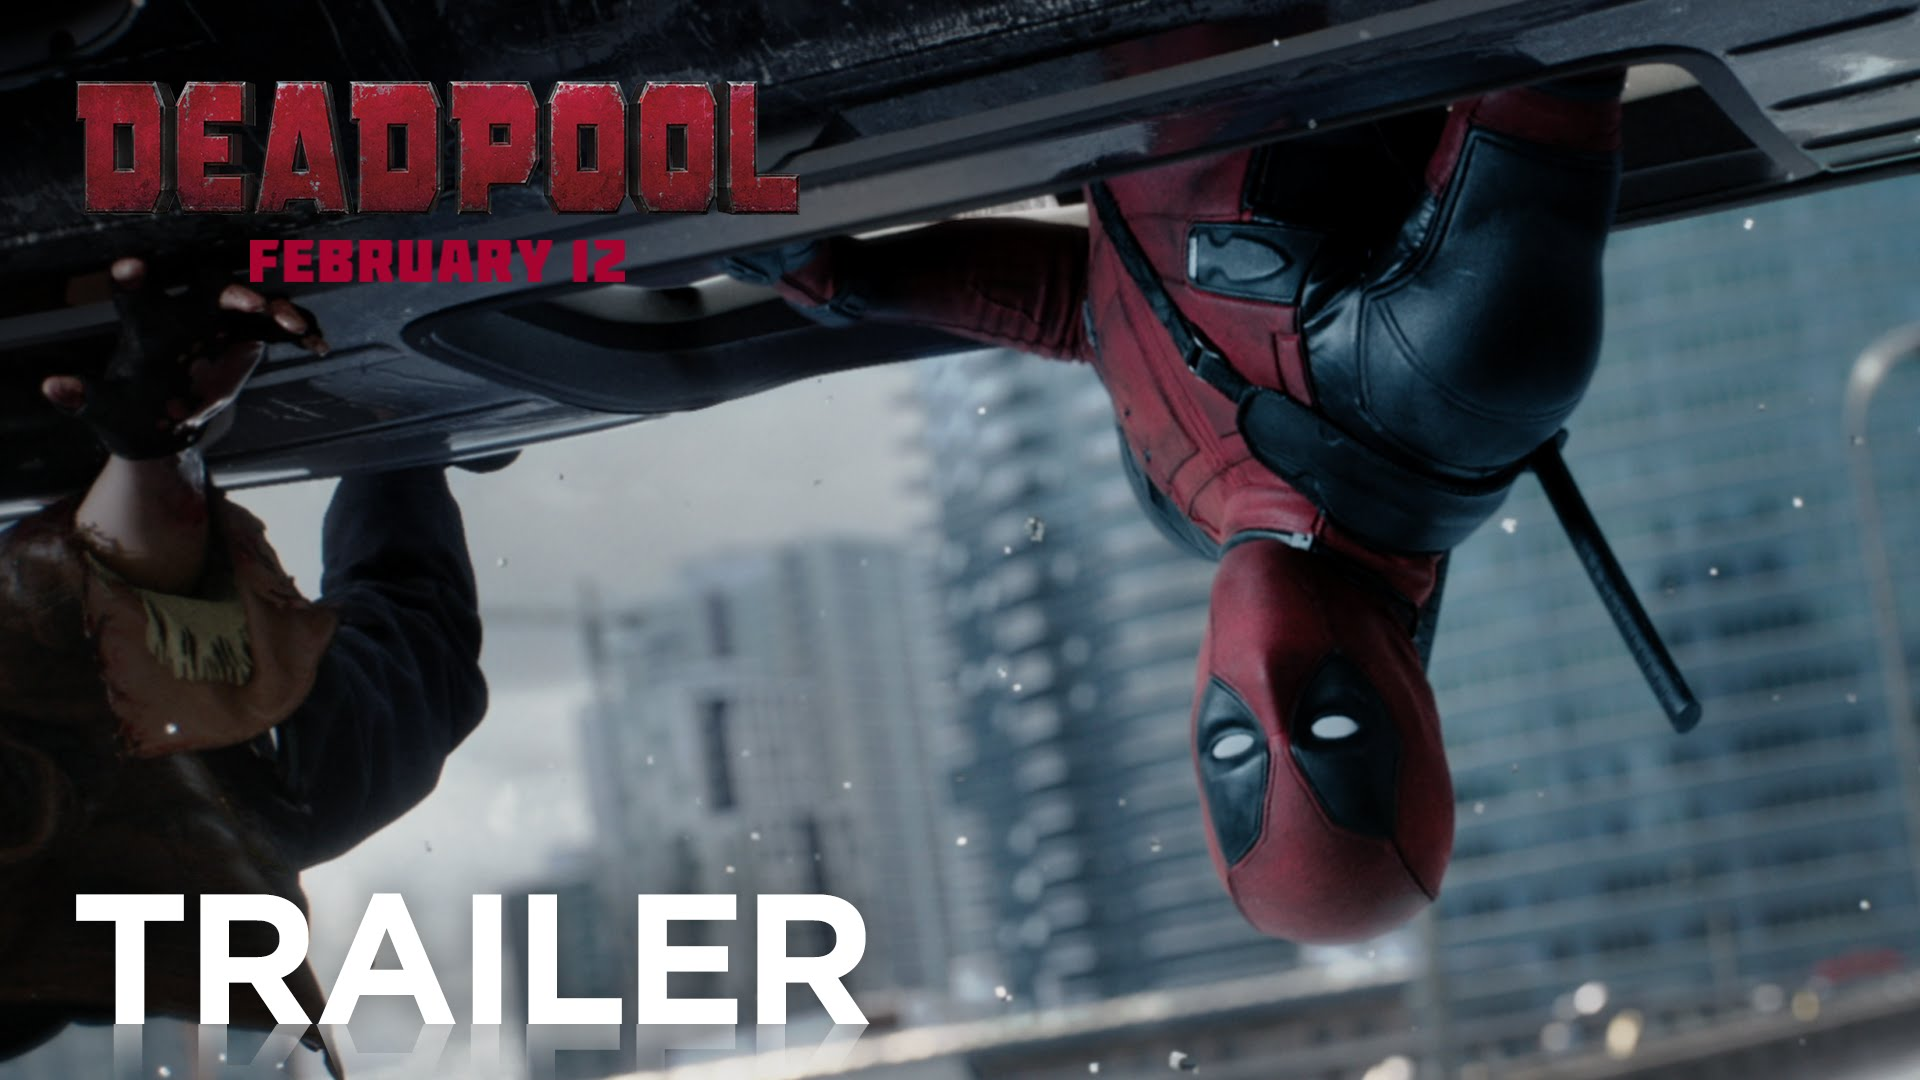 Deadpool Trailer - Feb 12